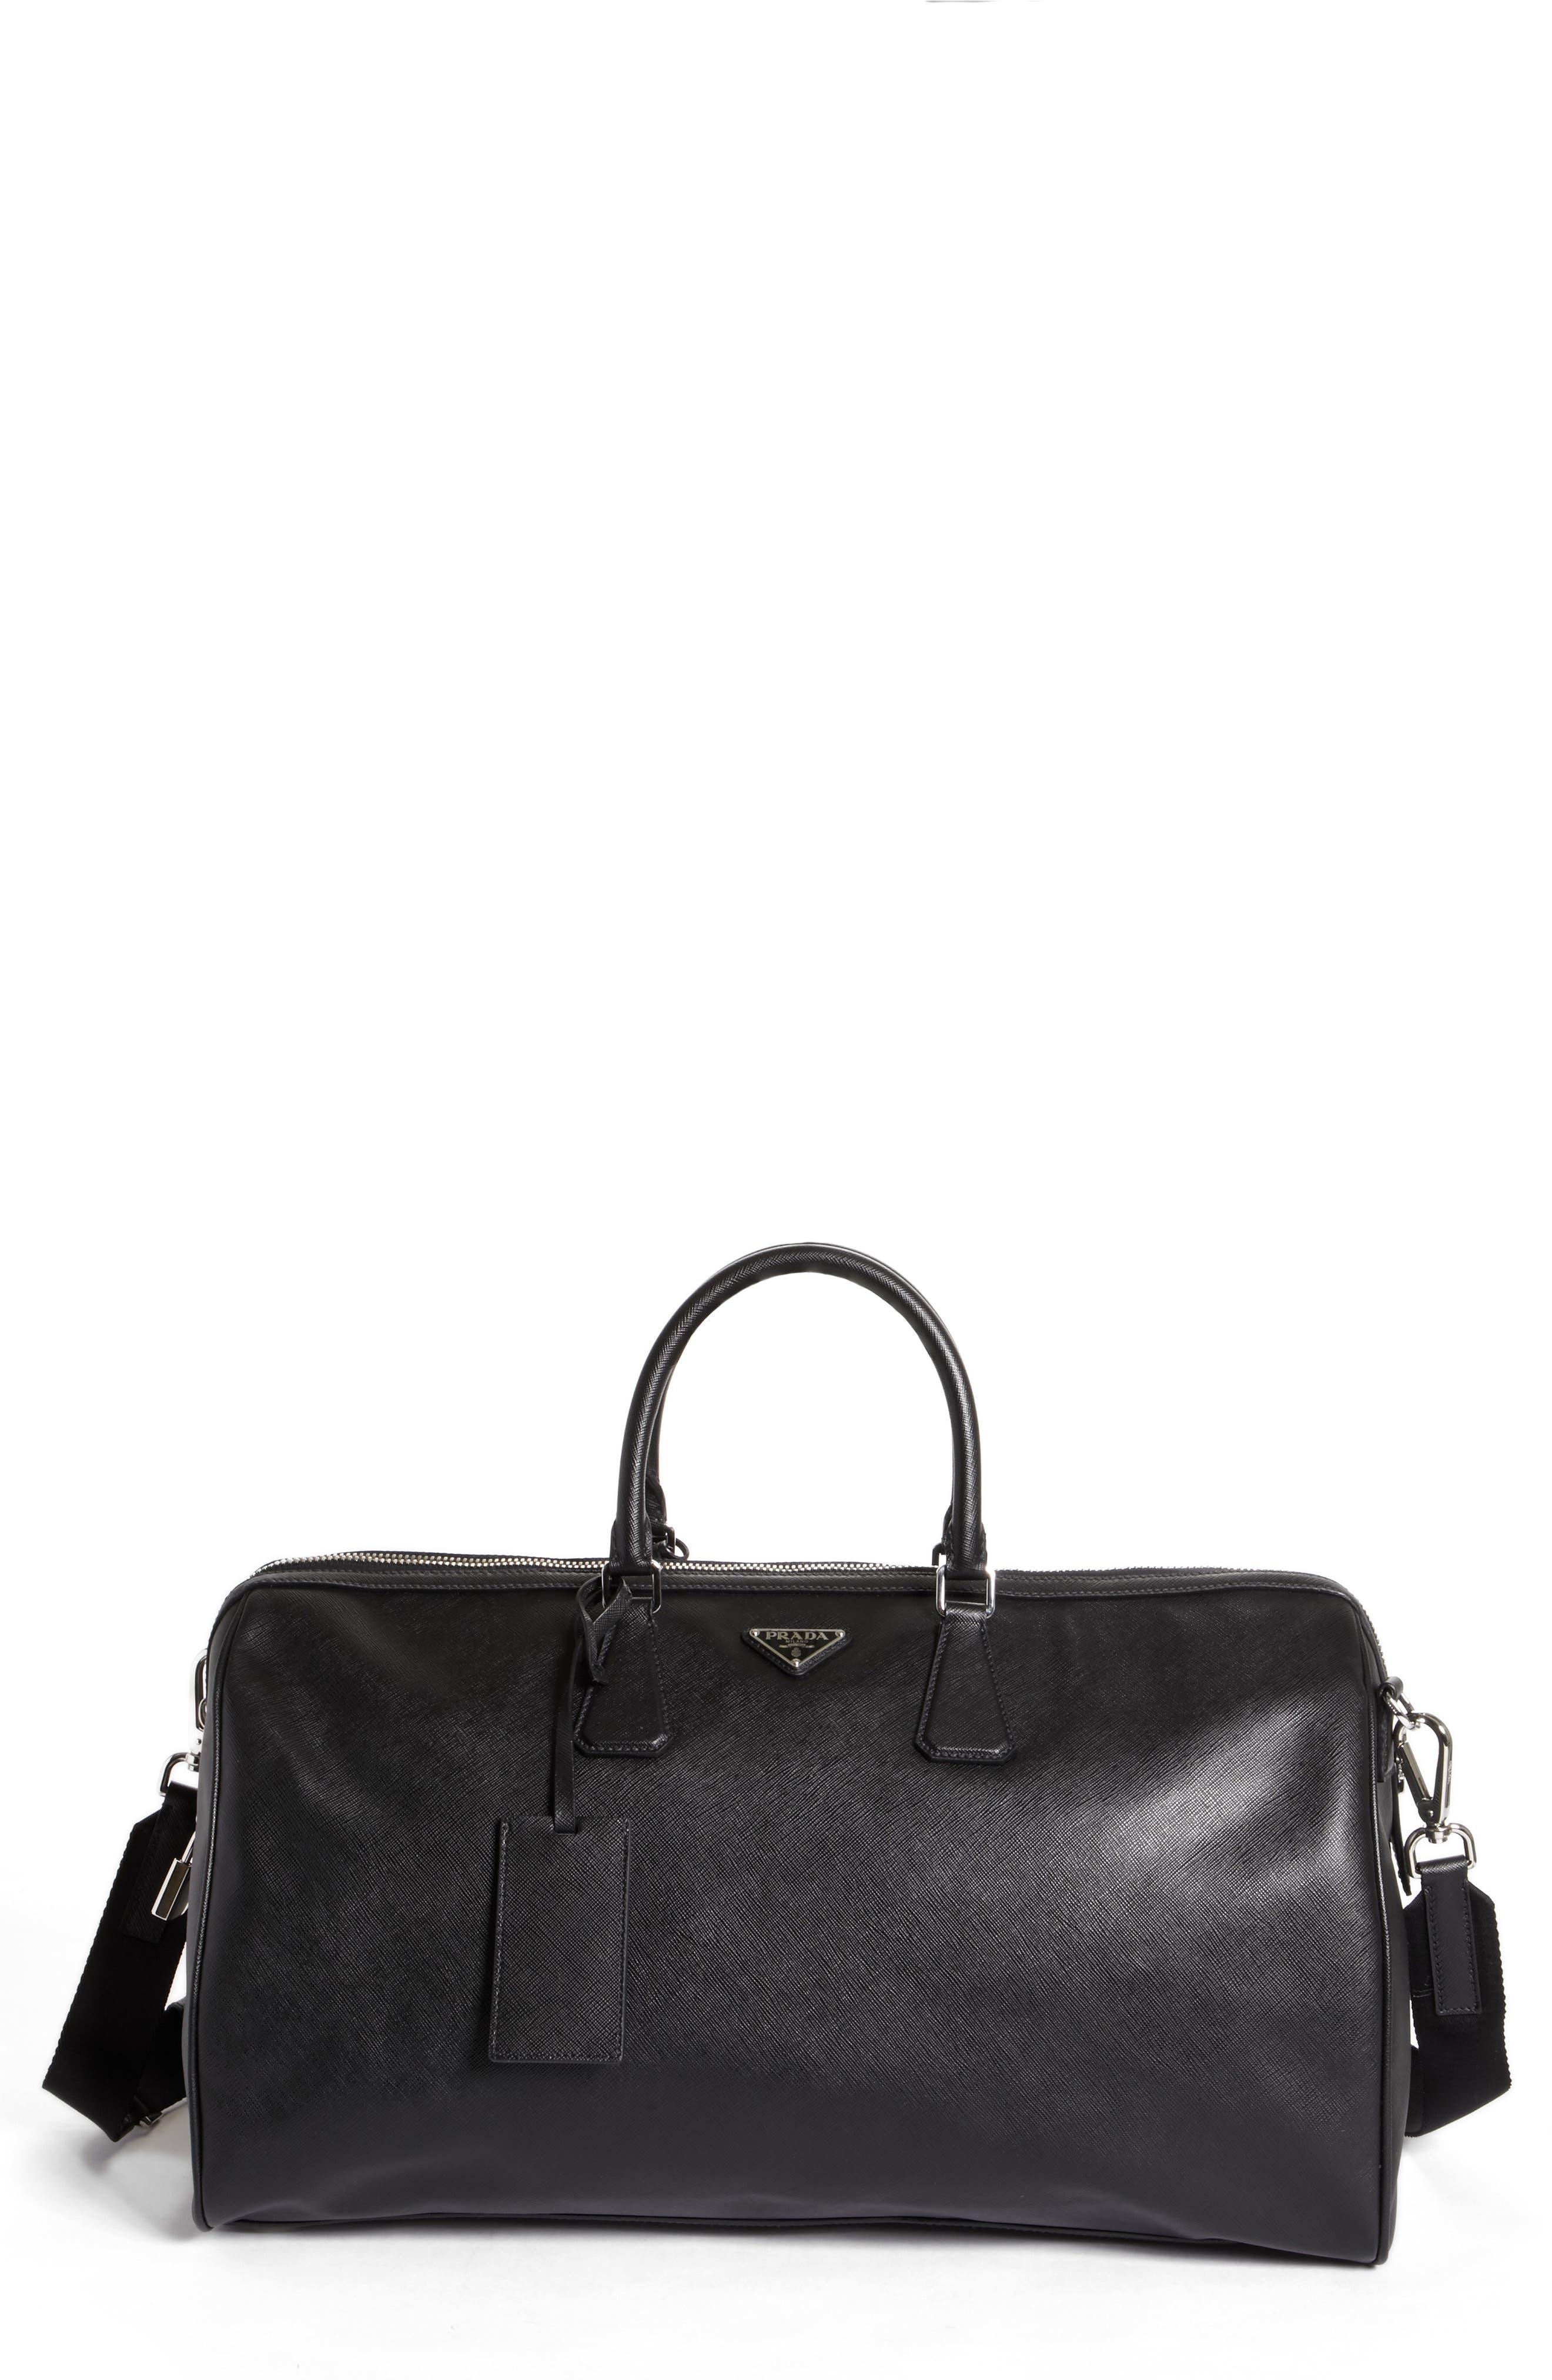 Prada Saffiano Leather Duffel Bag